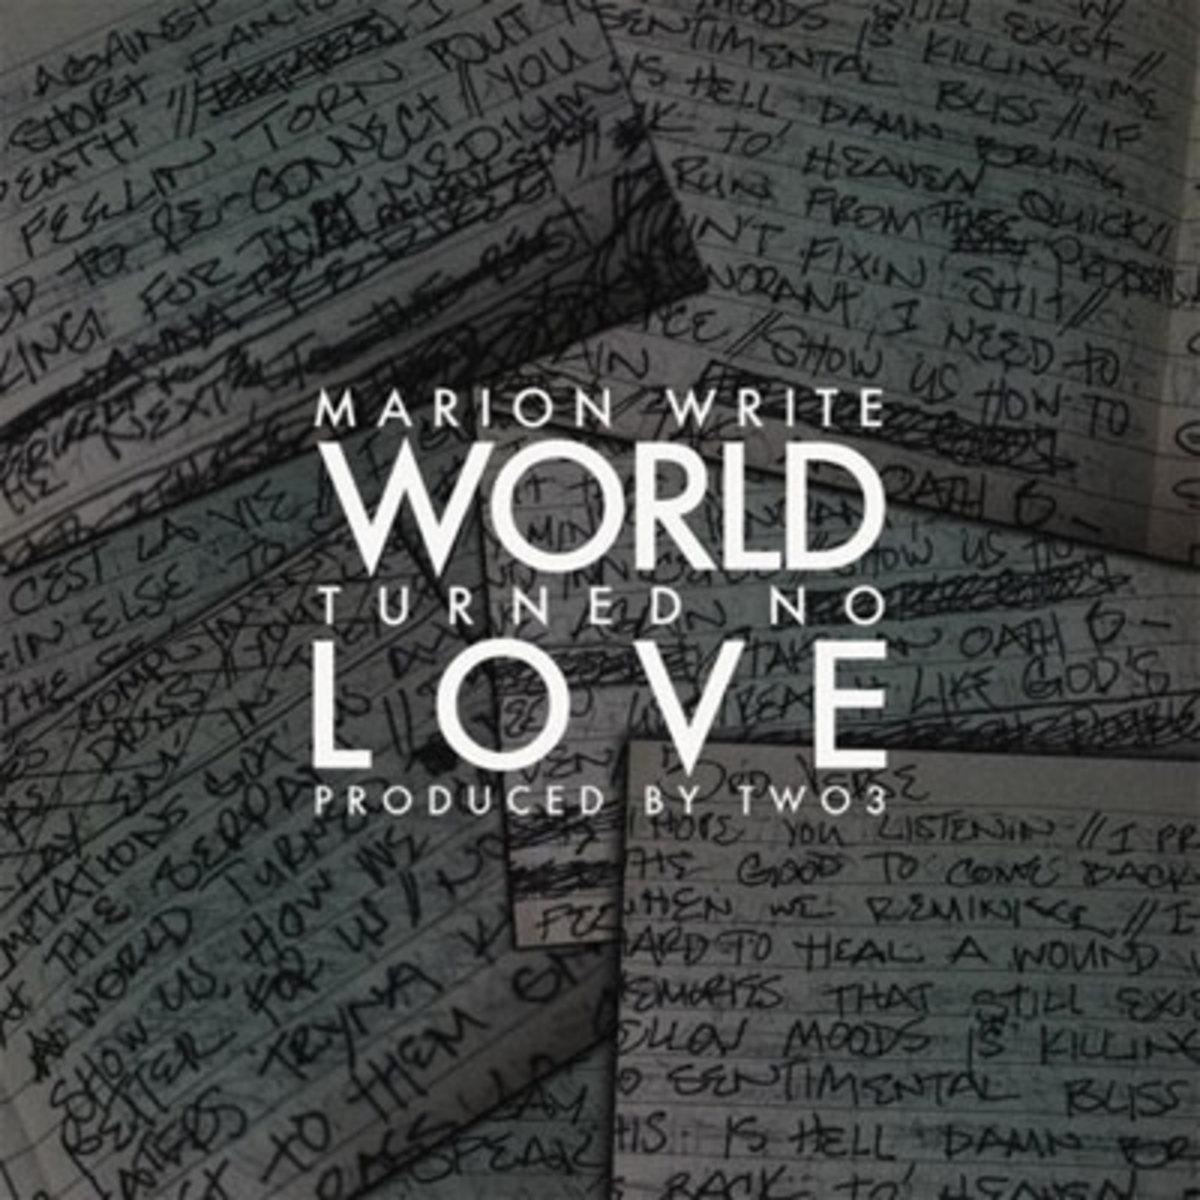 marionwrite-worldturnednolove.jpg